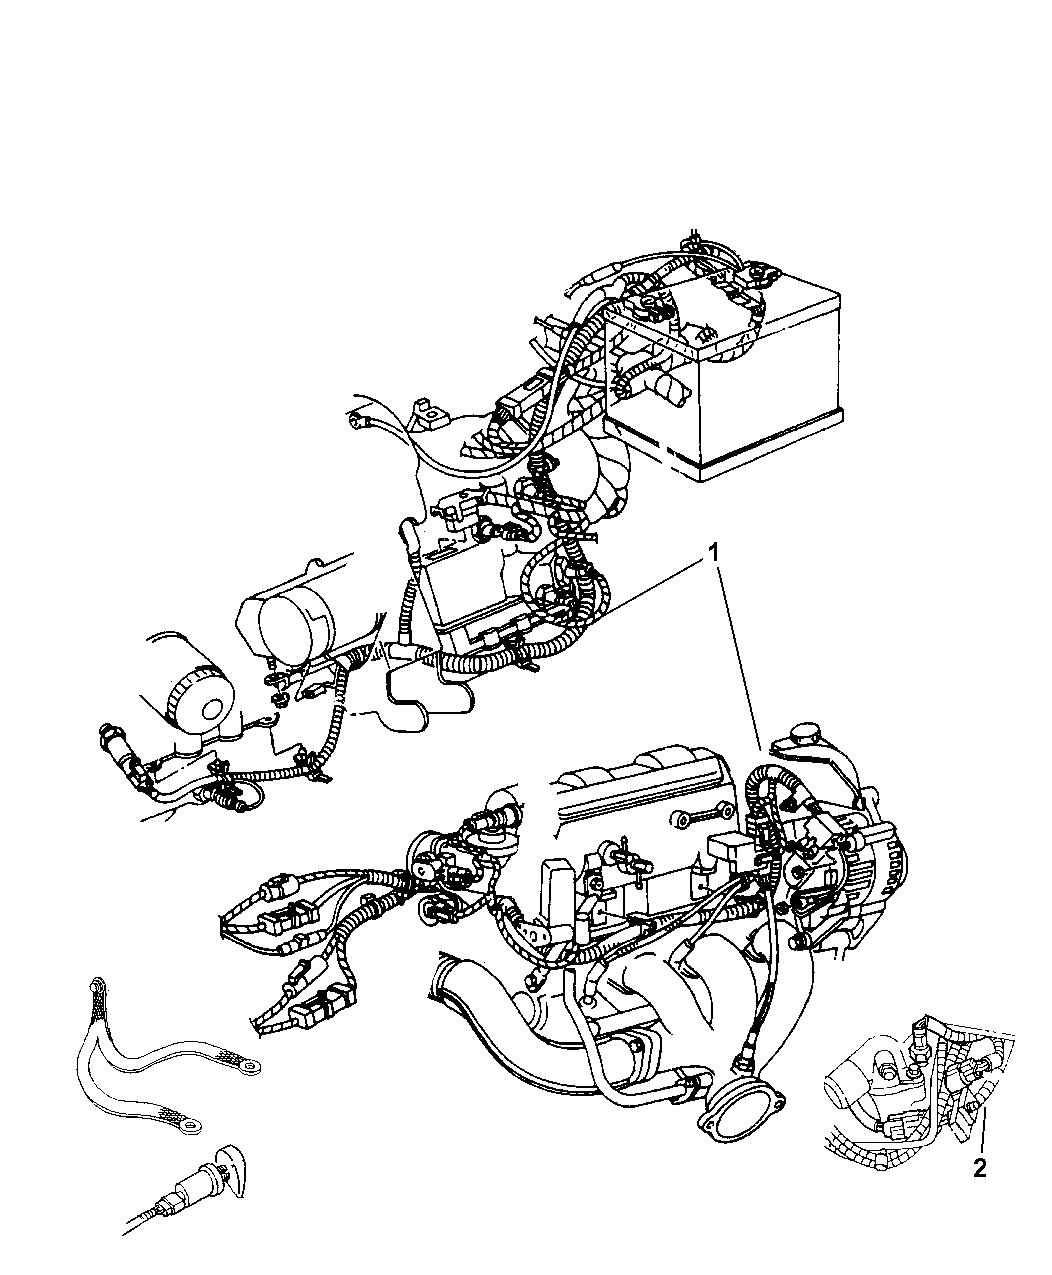 2005 Dodge Magnum Engine Diagram - Wiring Diagram For 1999 Blazer -  yjm308.tukune.jeanjaures37.frWiring Diagram Resource